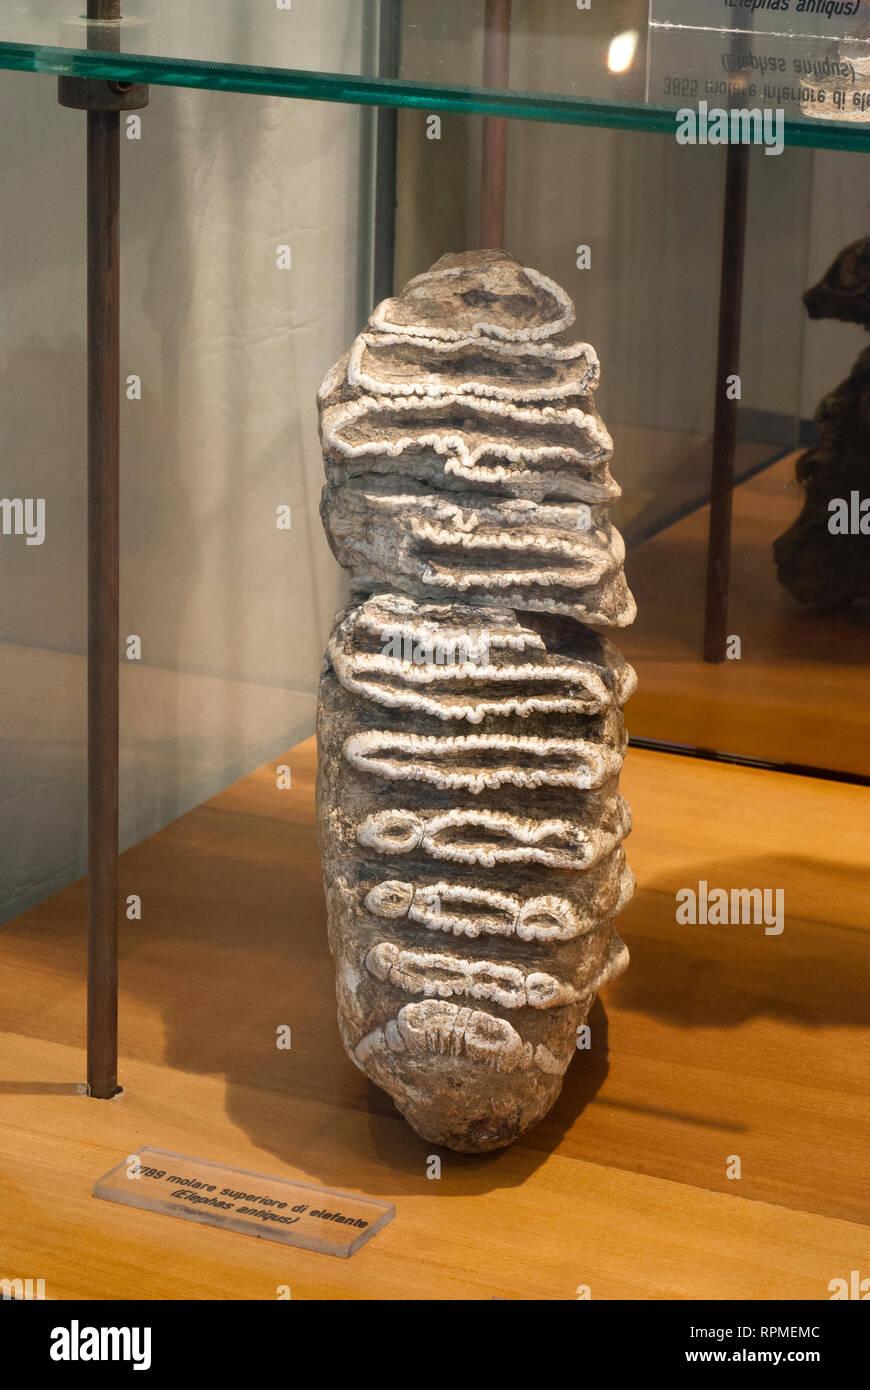 Molar tooth of Elephas (Palaeoloxodon) Antiquus, Prehistoric Museum of Pofi, Lazio, Italy - Stock Image